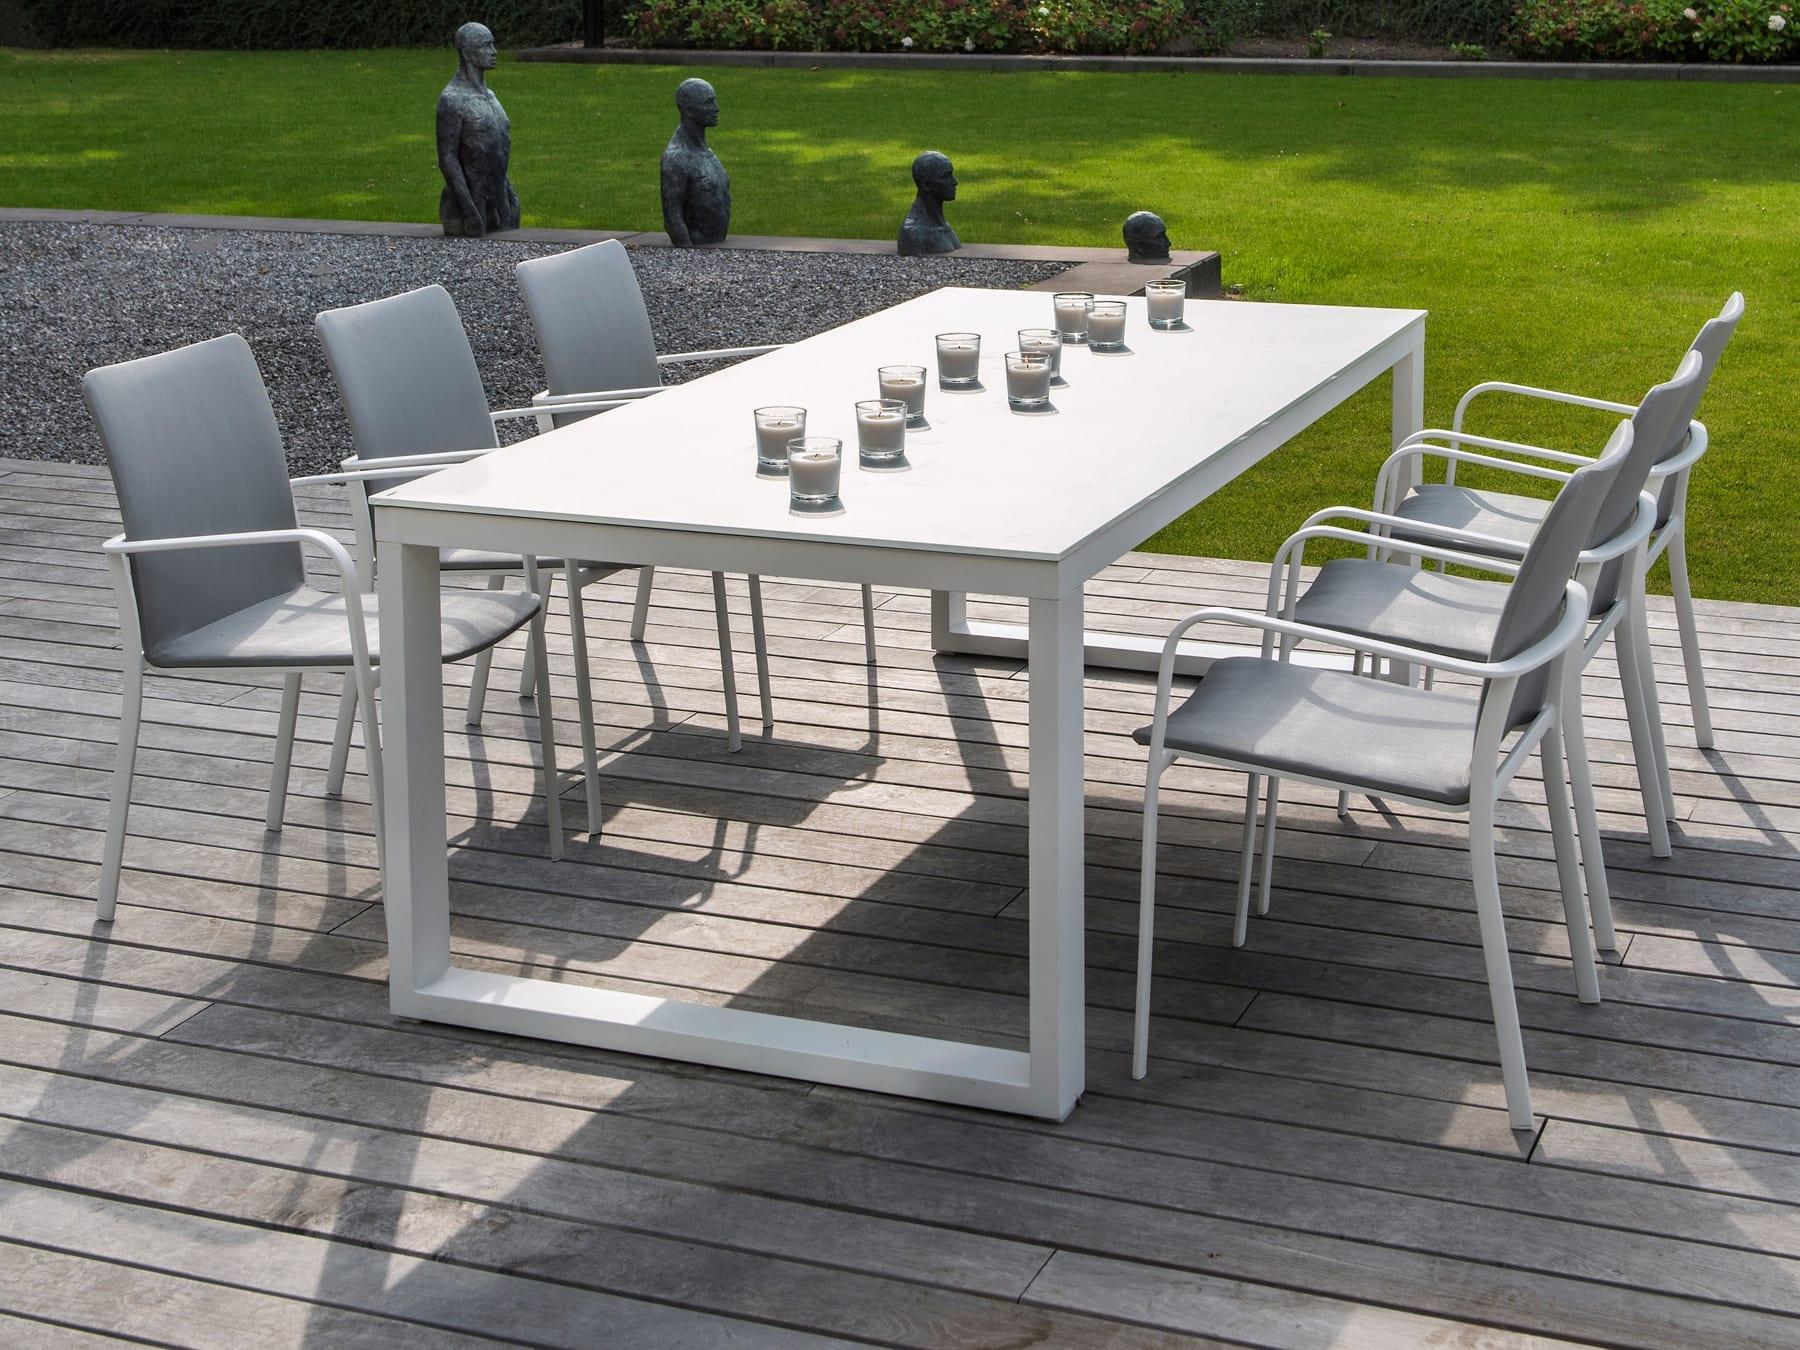 jati kebon mckenzie willis rh mckenzieandwillis co nz jati outdoor tables jati outdoor furniture sale